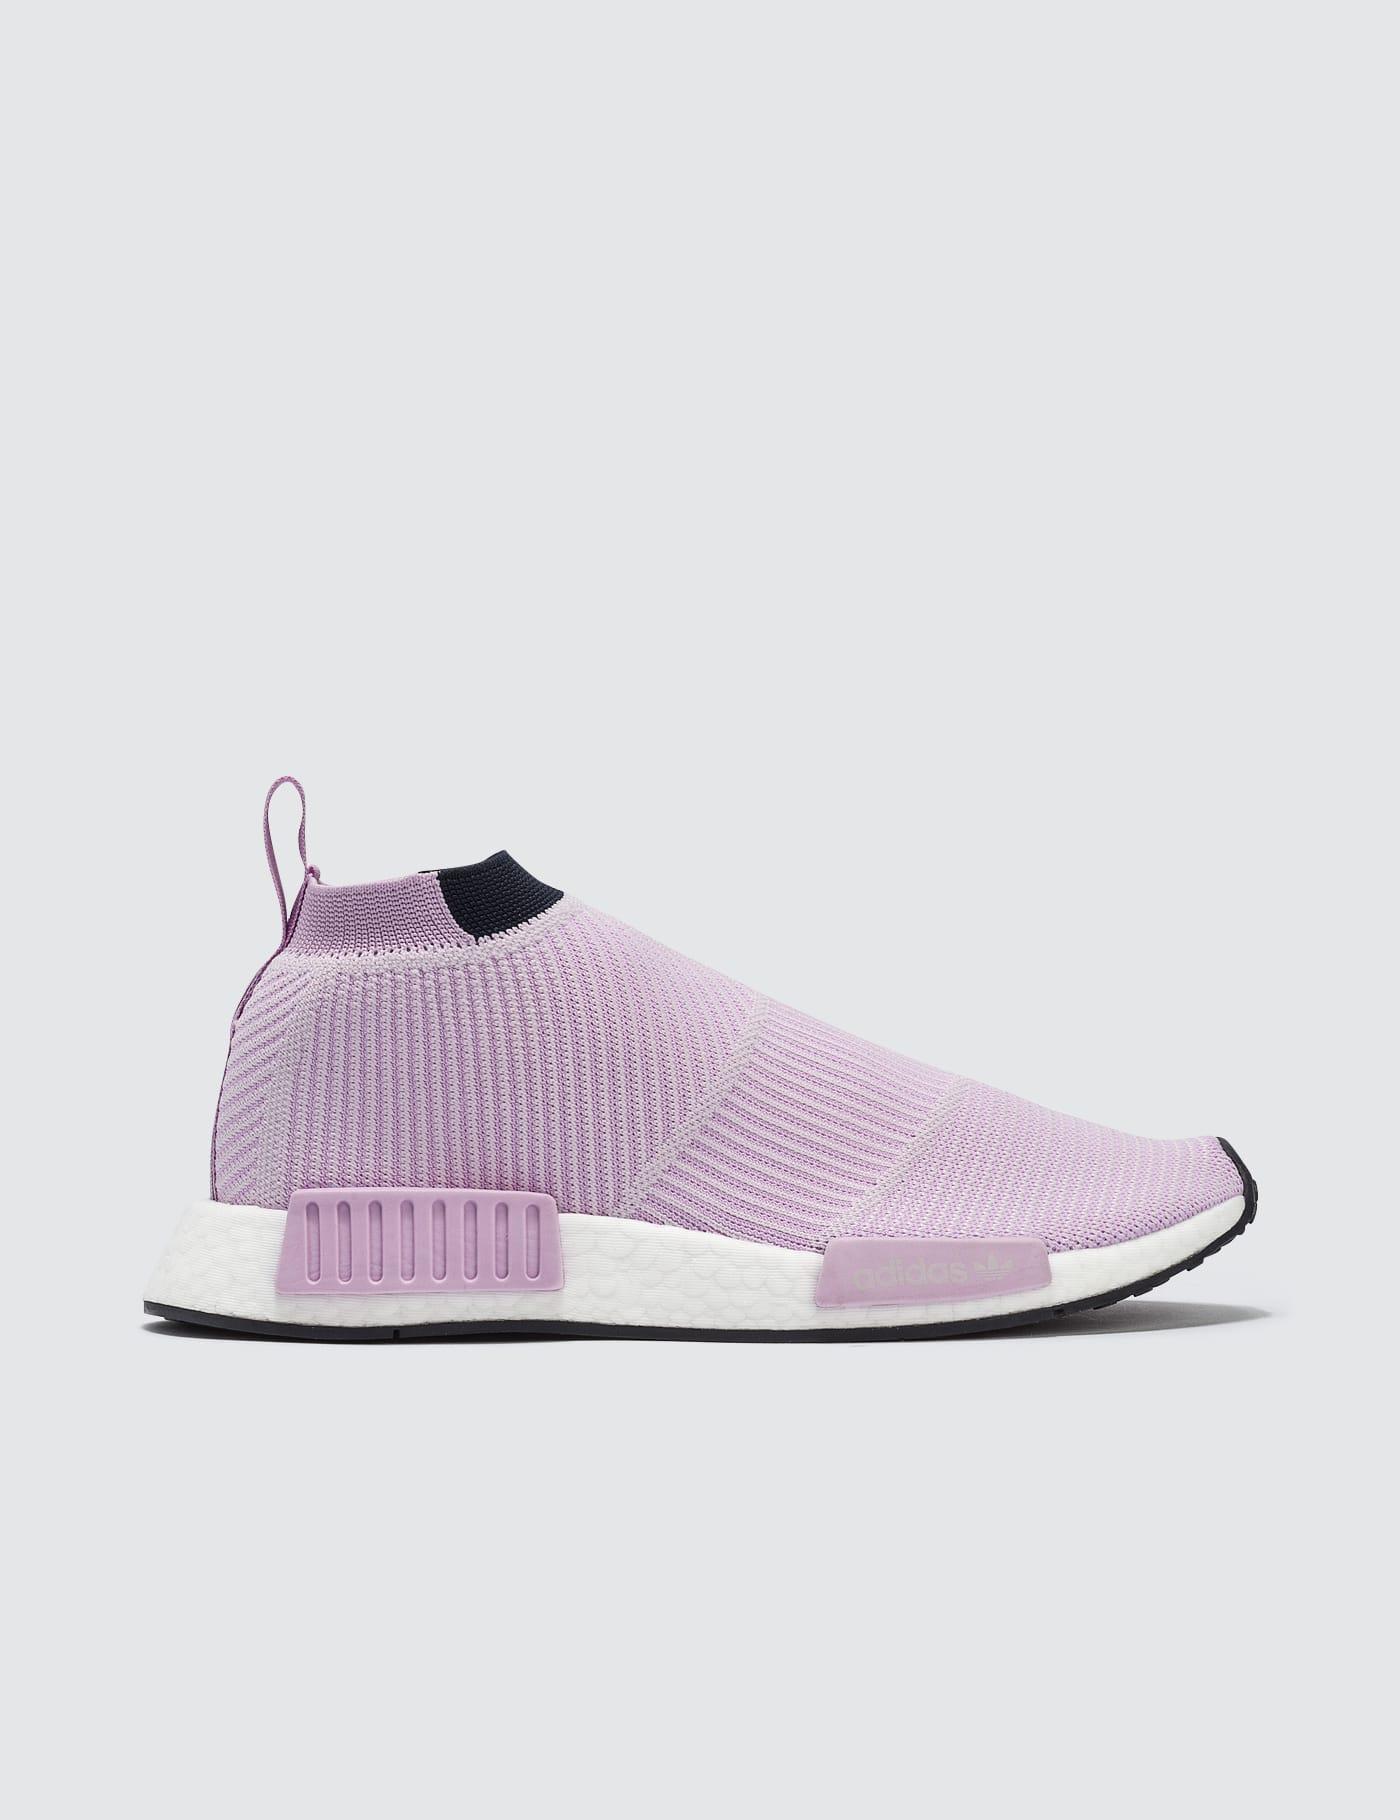 adidas nmd cs1 pink